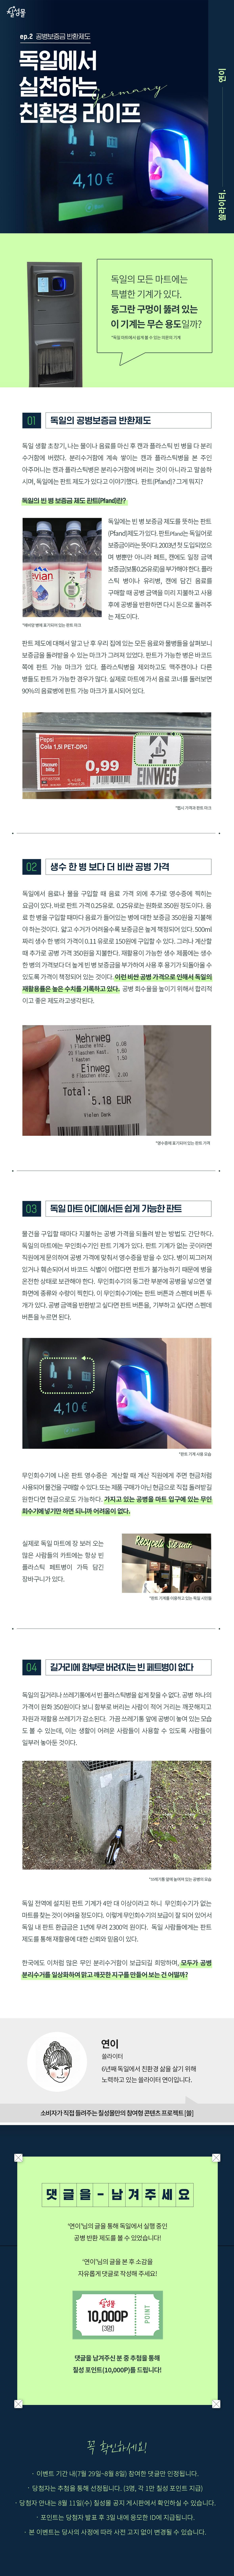 ep10 쓸만한 연이 두번째 이야기